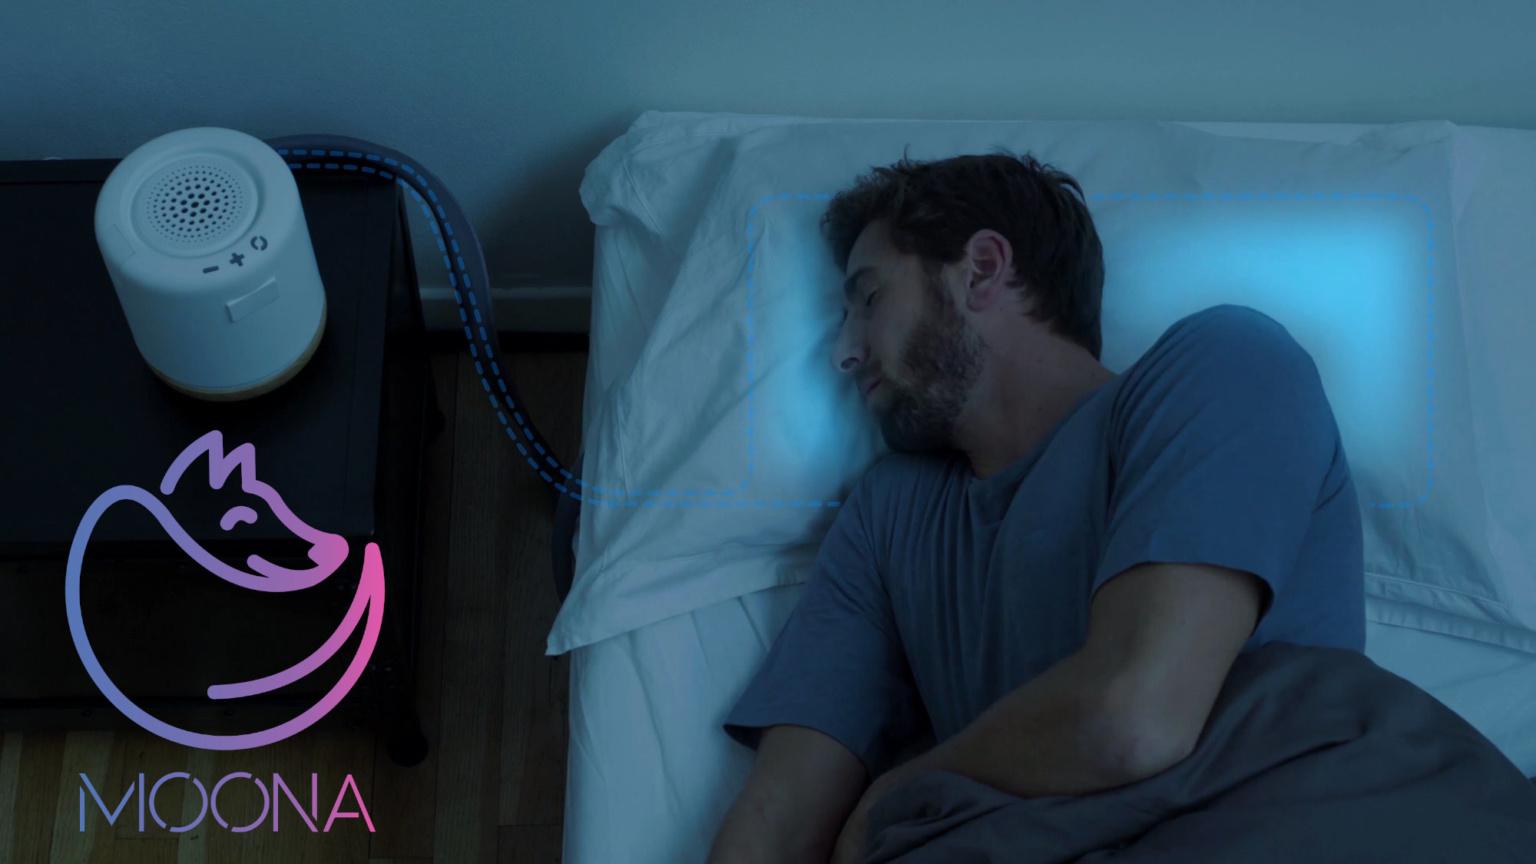 cooling technology for better sleep